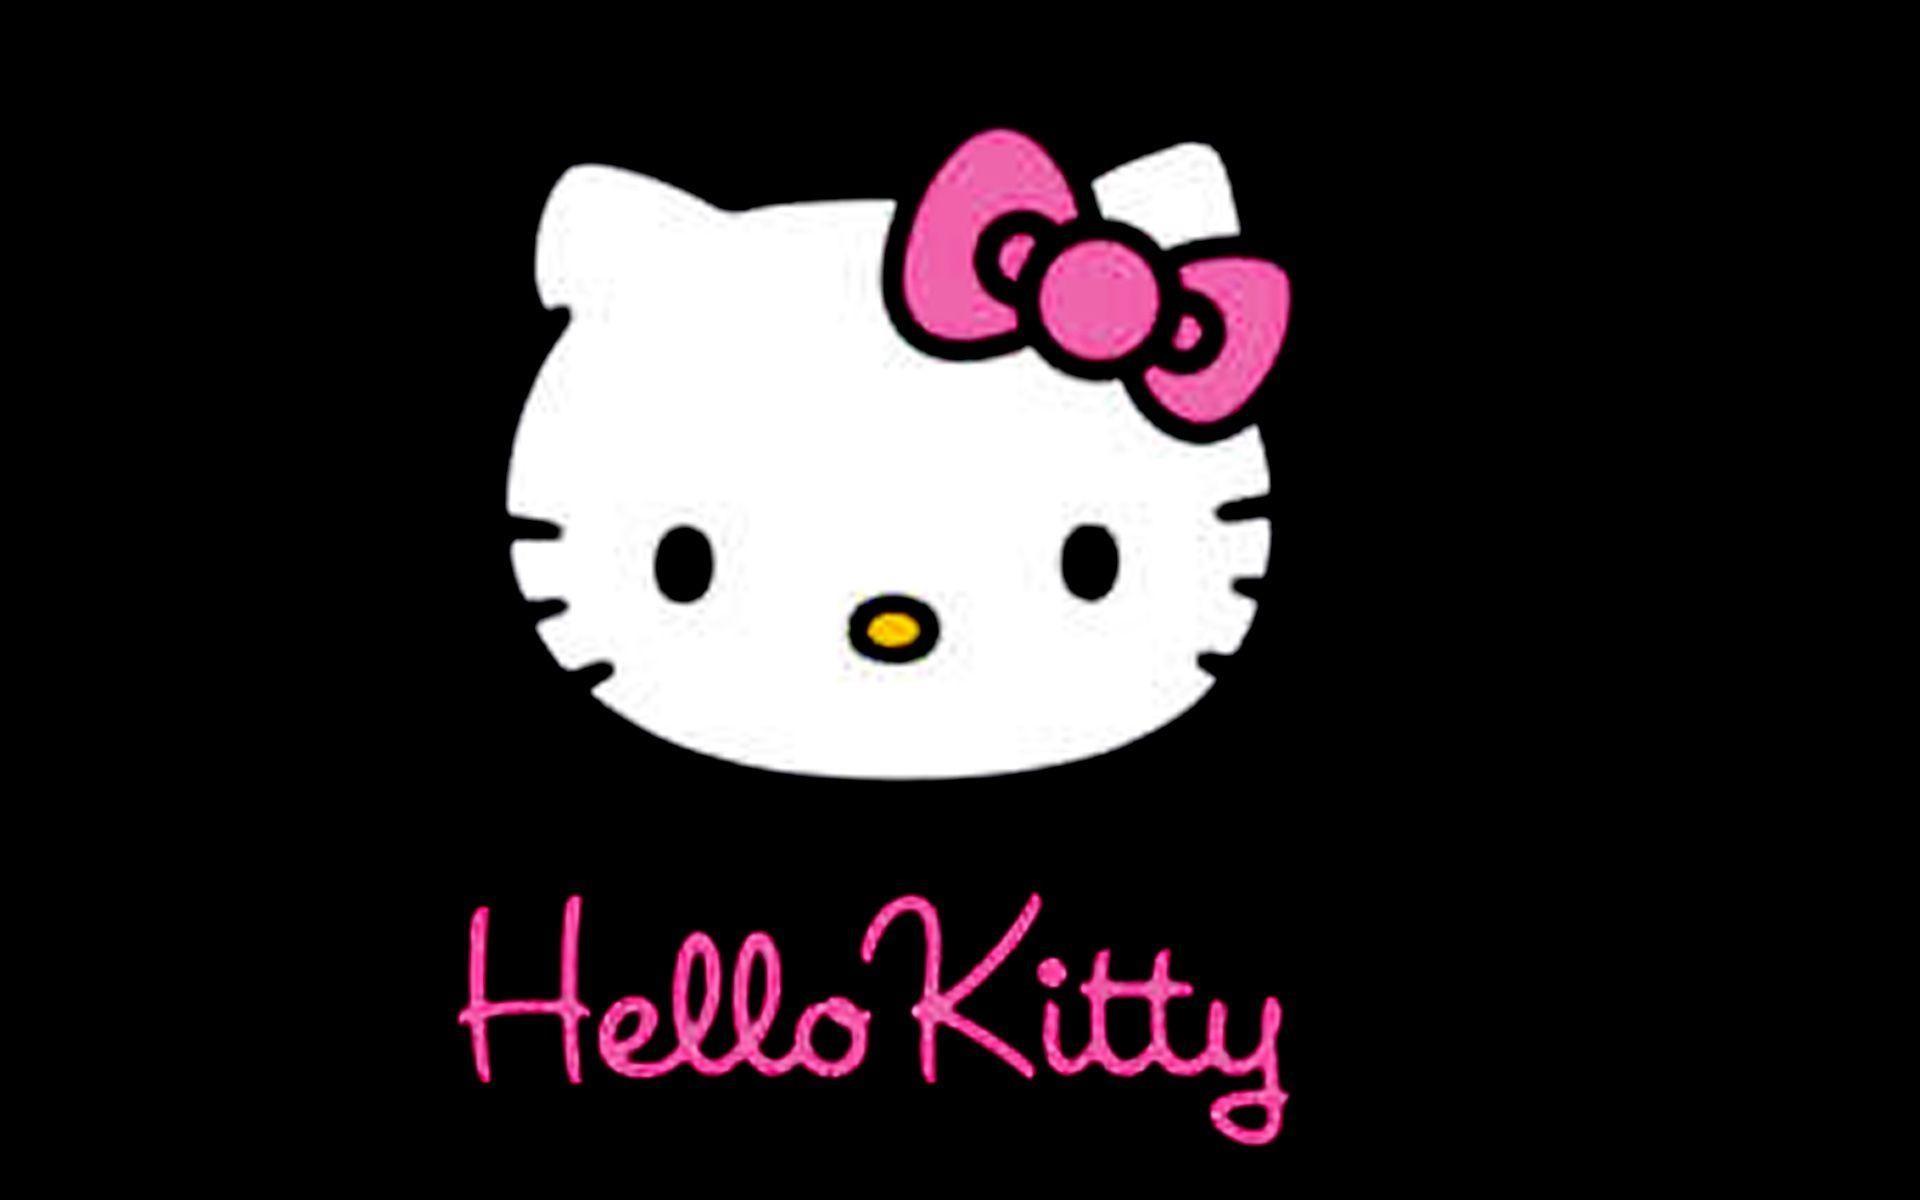 Amazing Wallpaper Hello Kitty Smartphone - 620572-hello-kitty-wallpapers-and-screensavers-1920x1200-smartphone  HD_96792.jpg